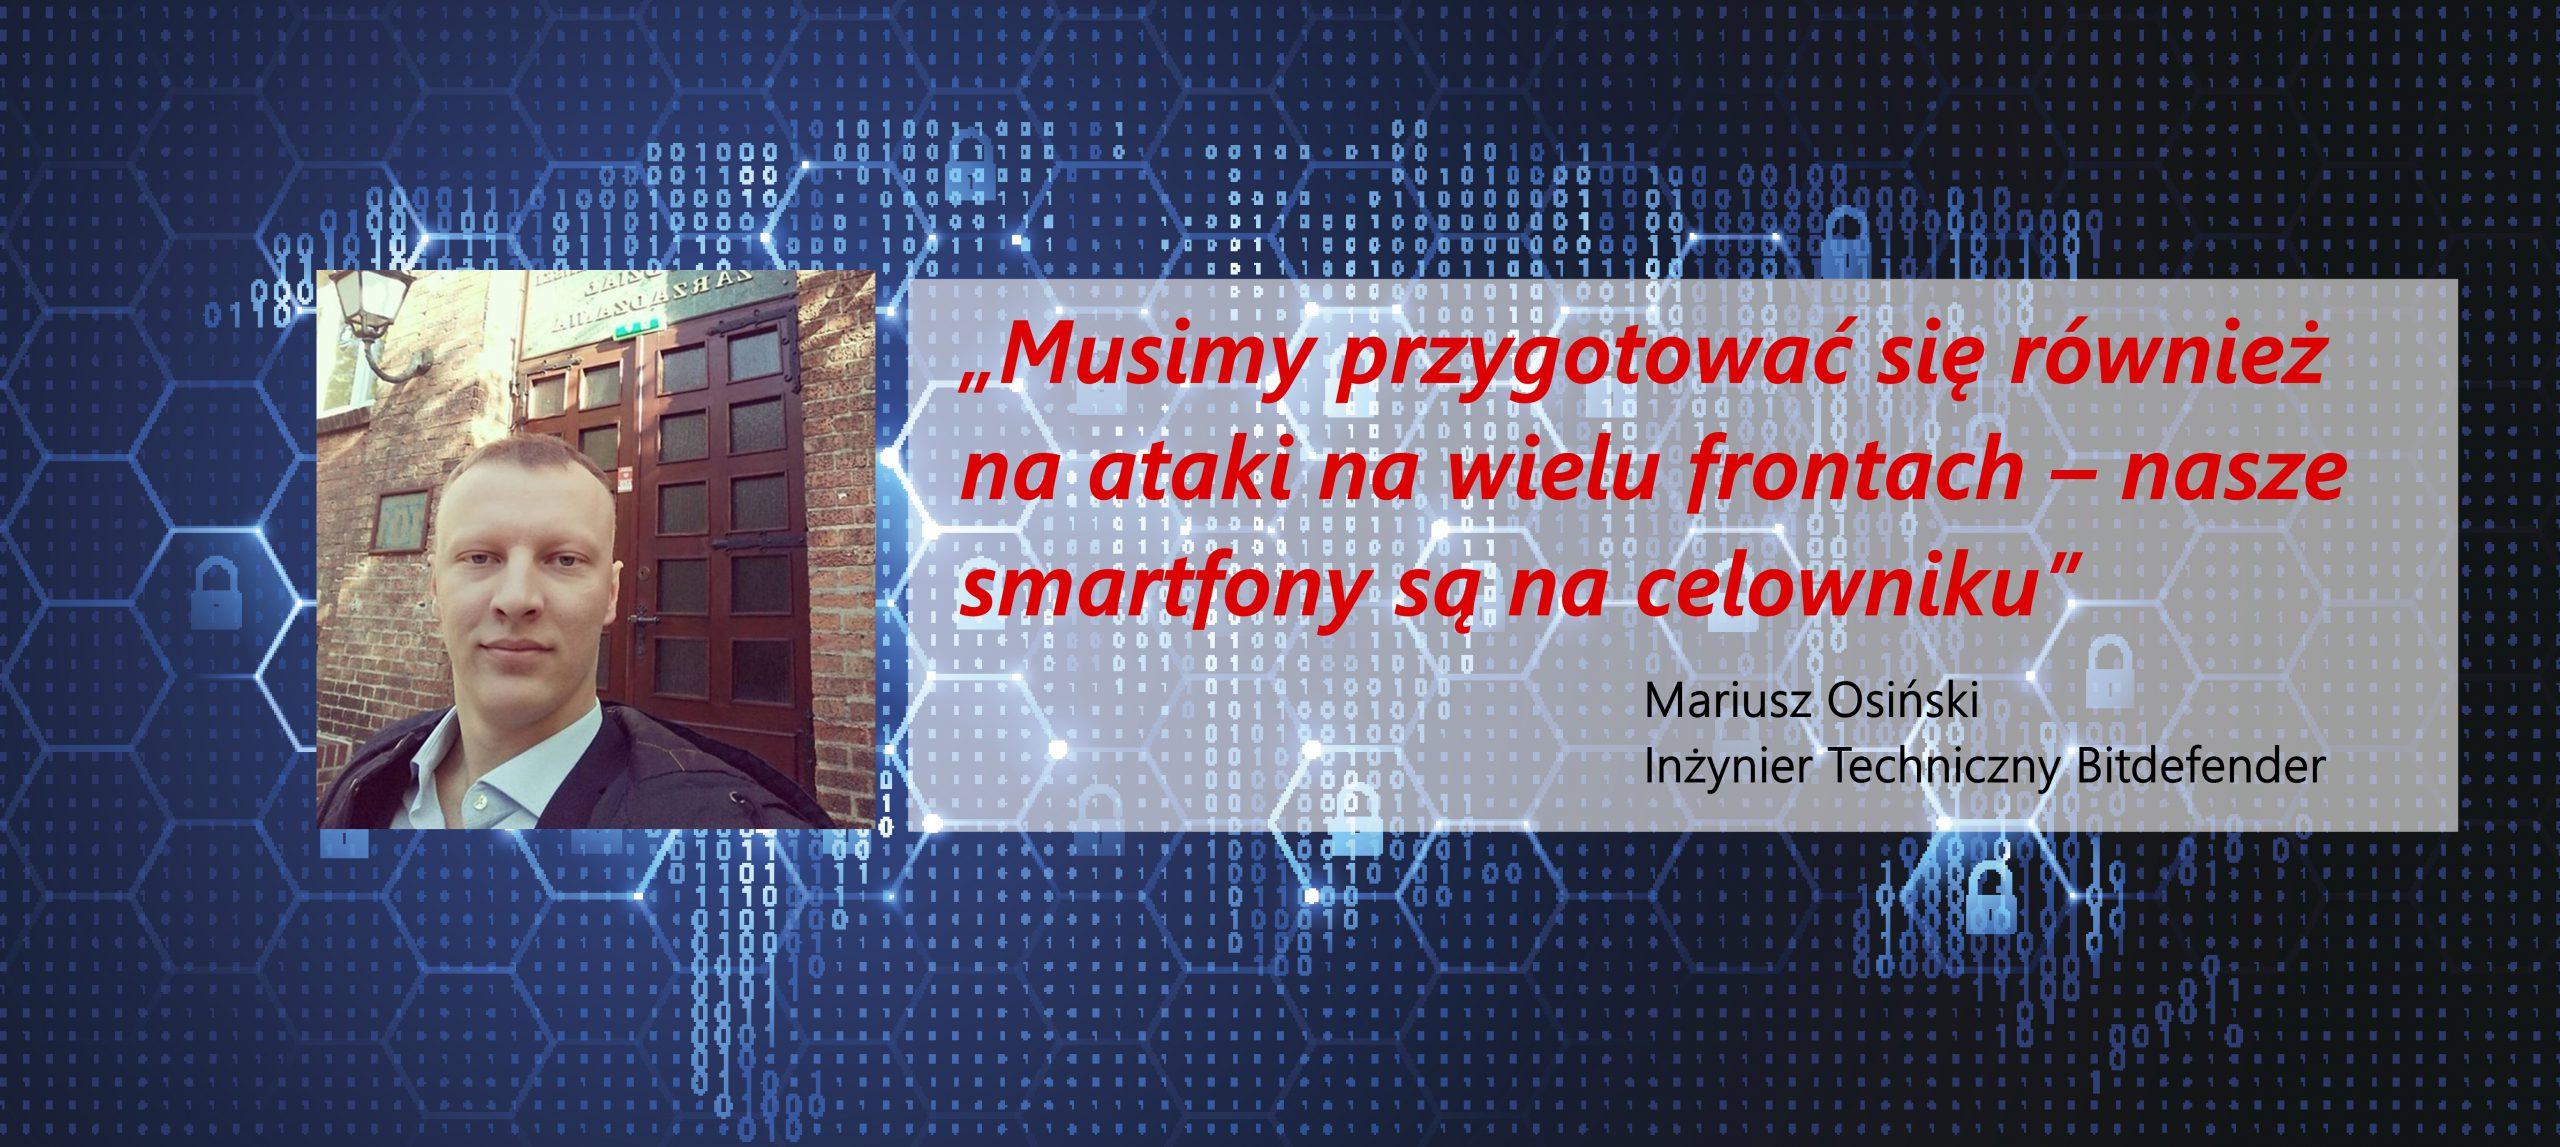 Mariusz Osiński z Bitdefender